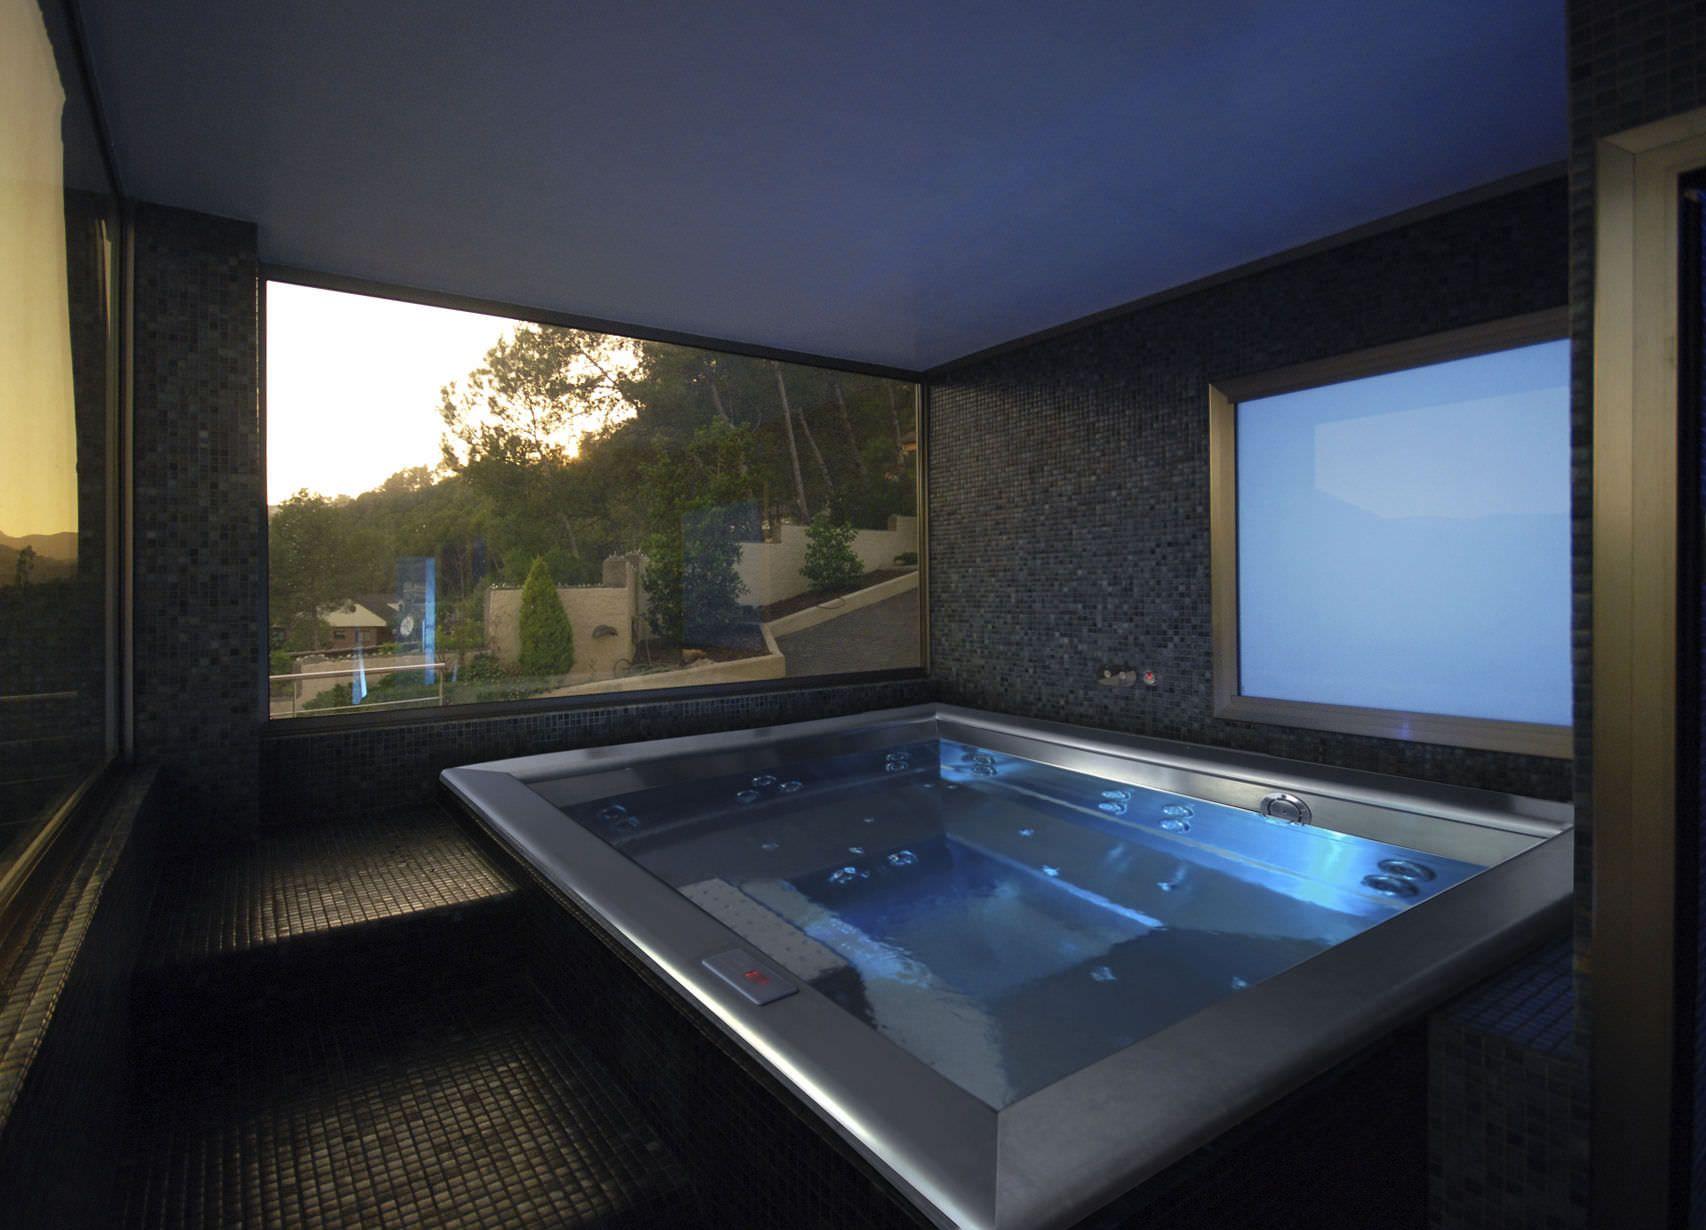 Built-in hot tub / rectangular / 2-seater / stainless steel - Inbeca ...